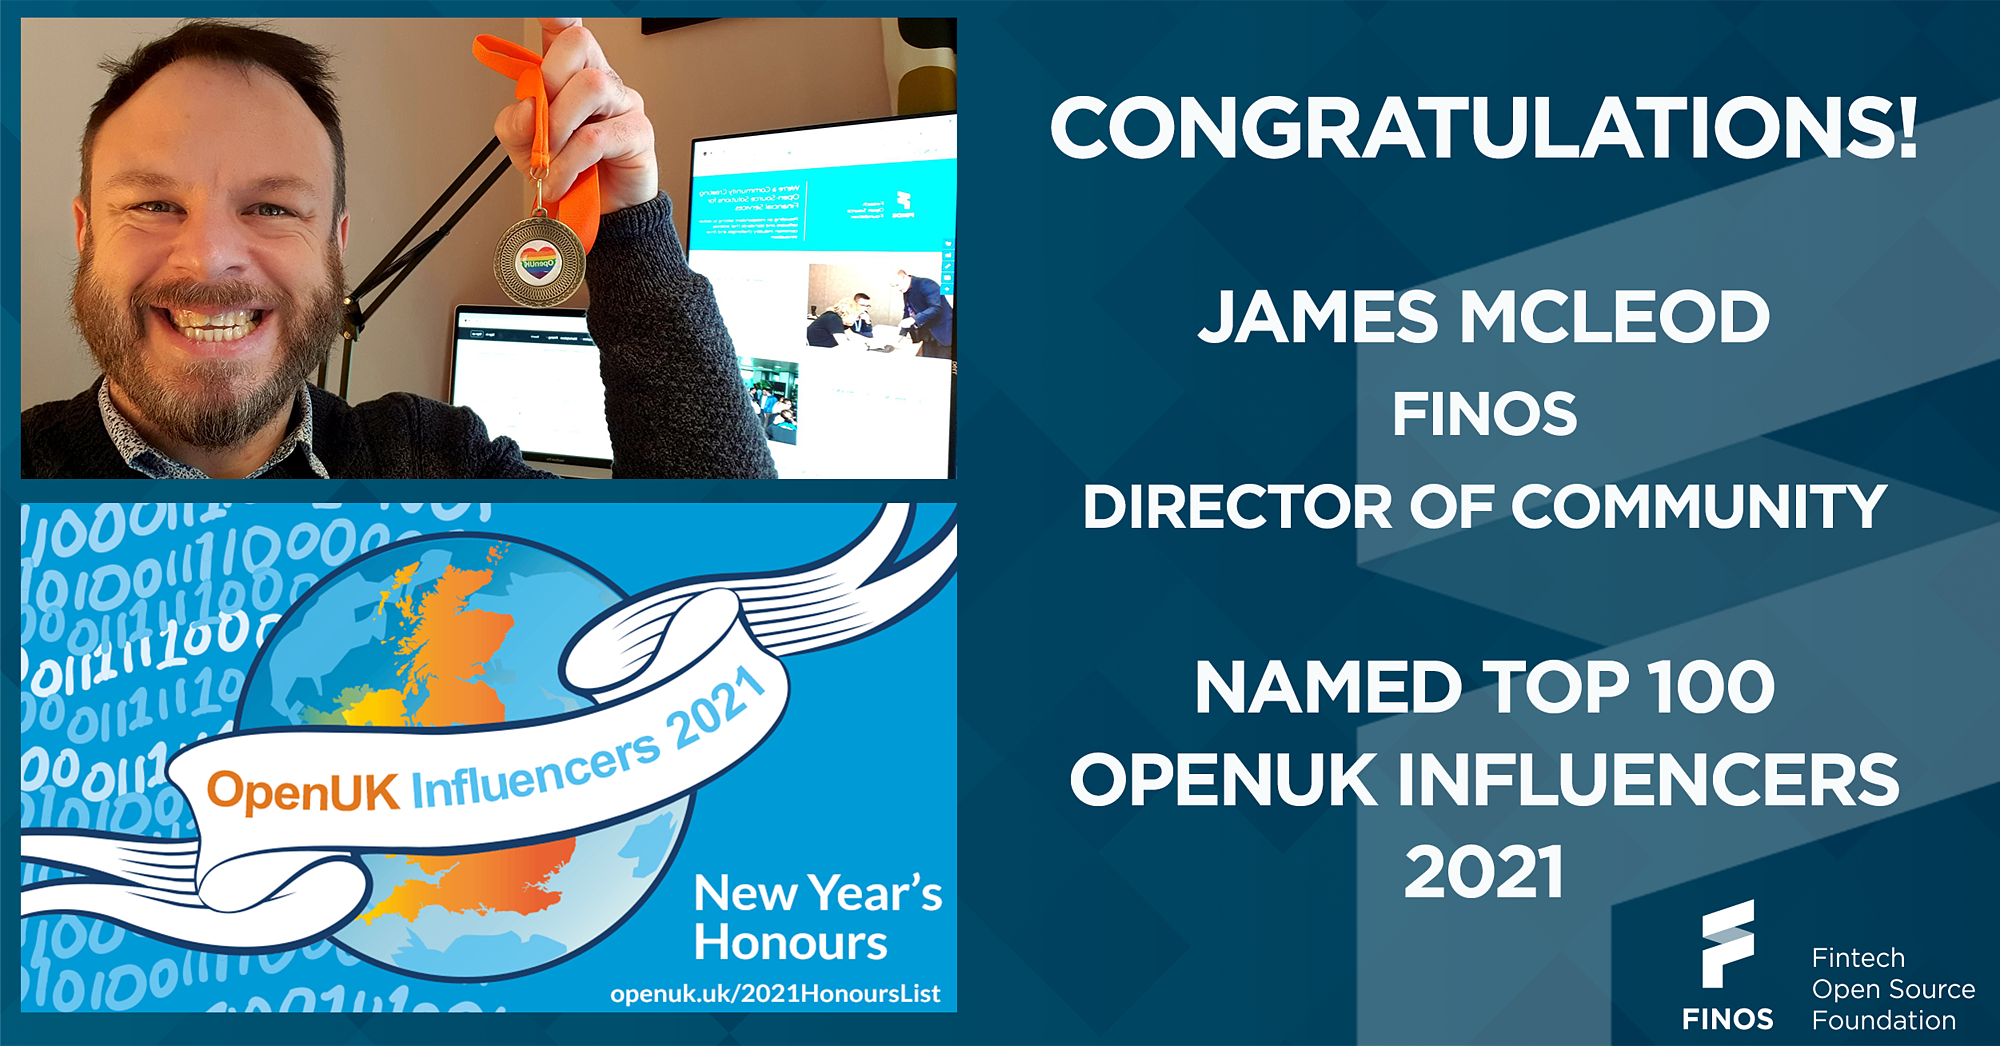 FINOS-james-mcleod-top-100-openuk-influencers